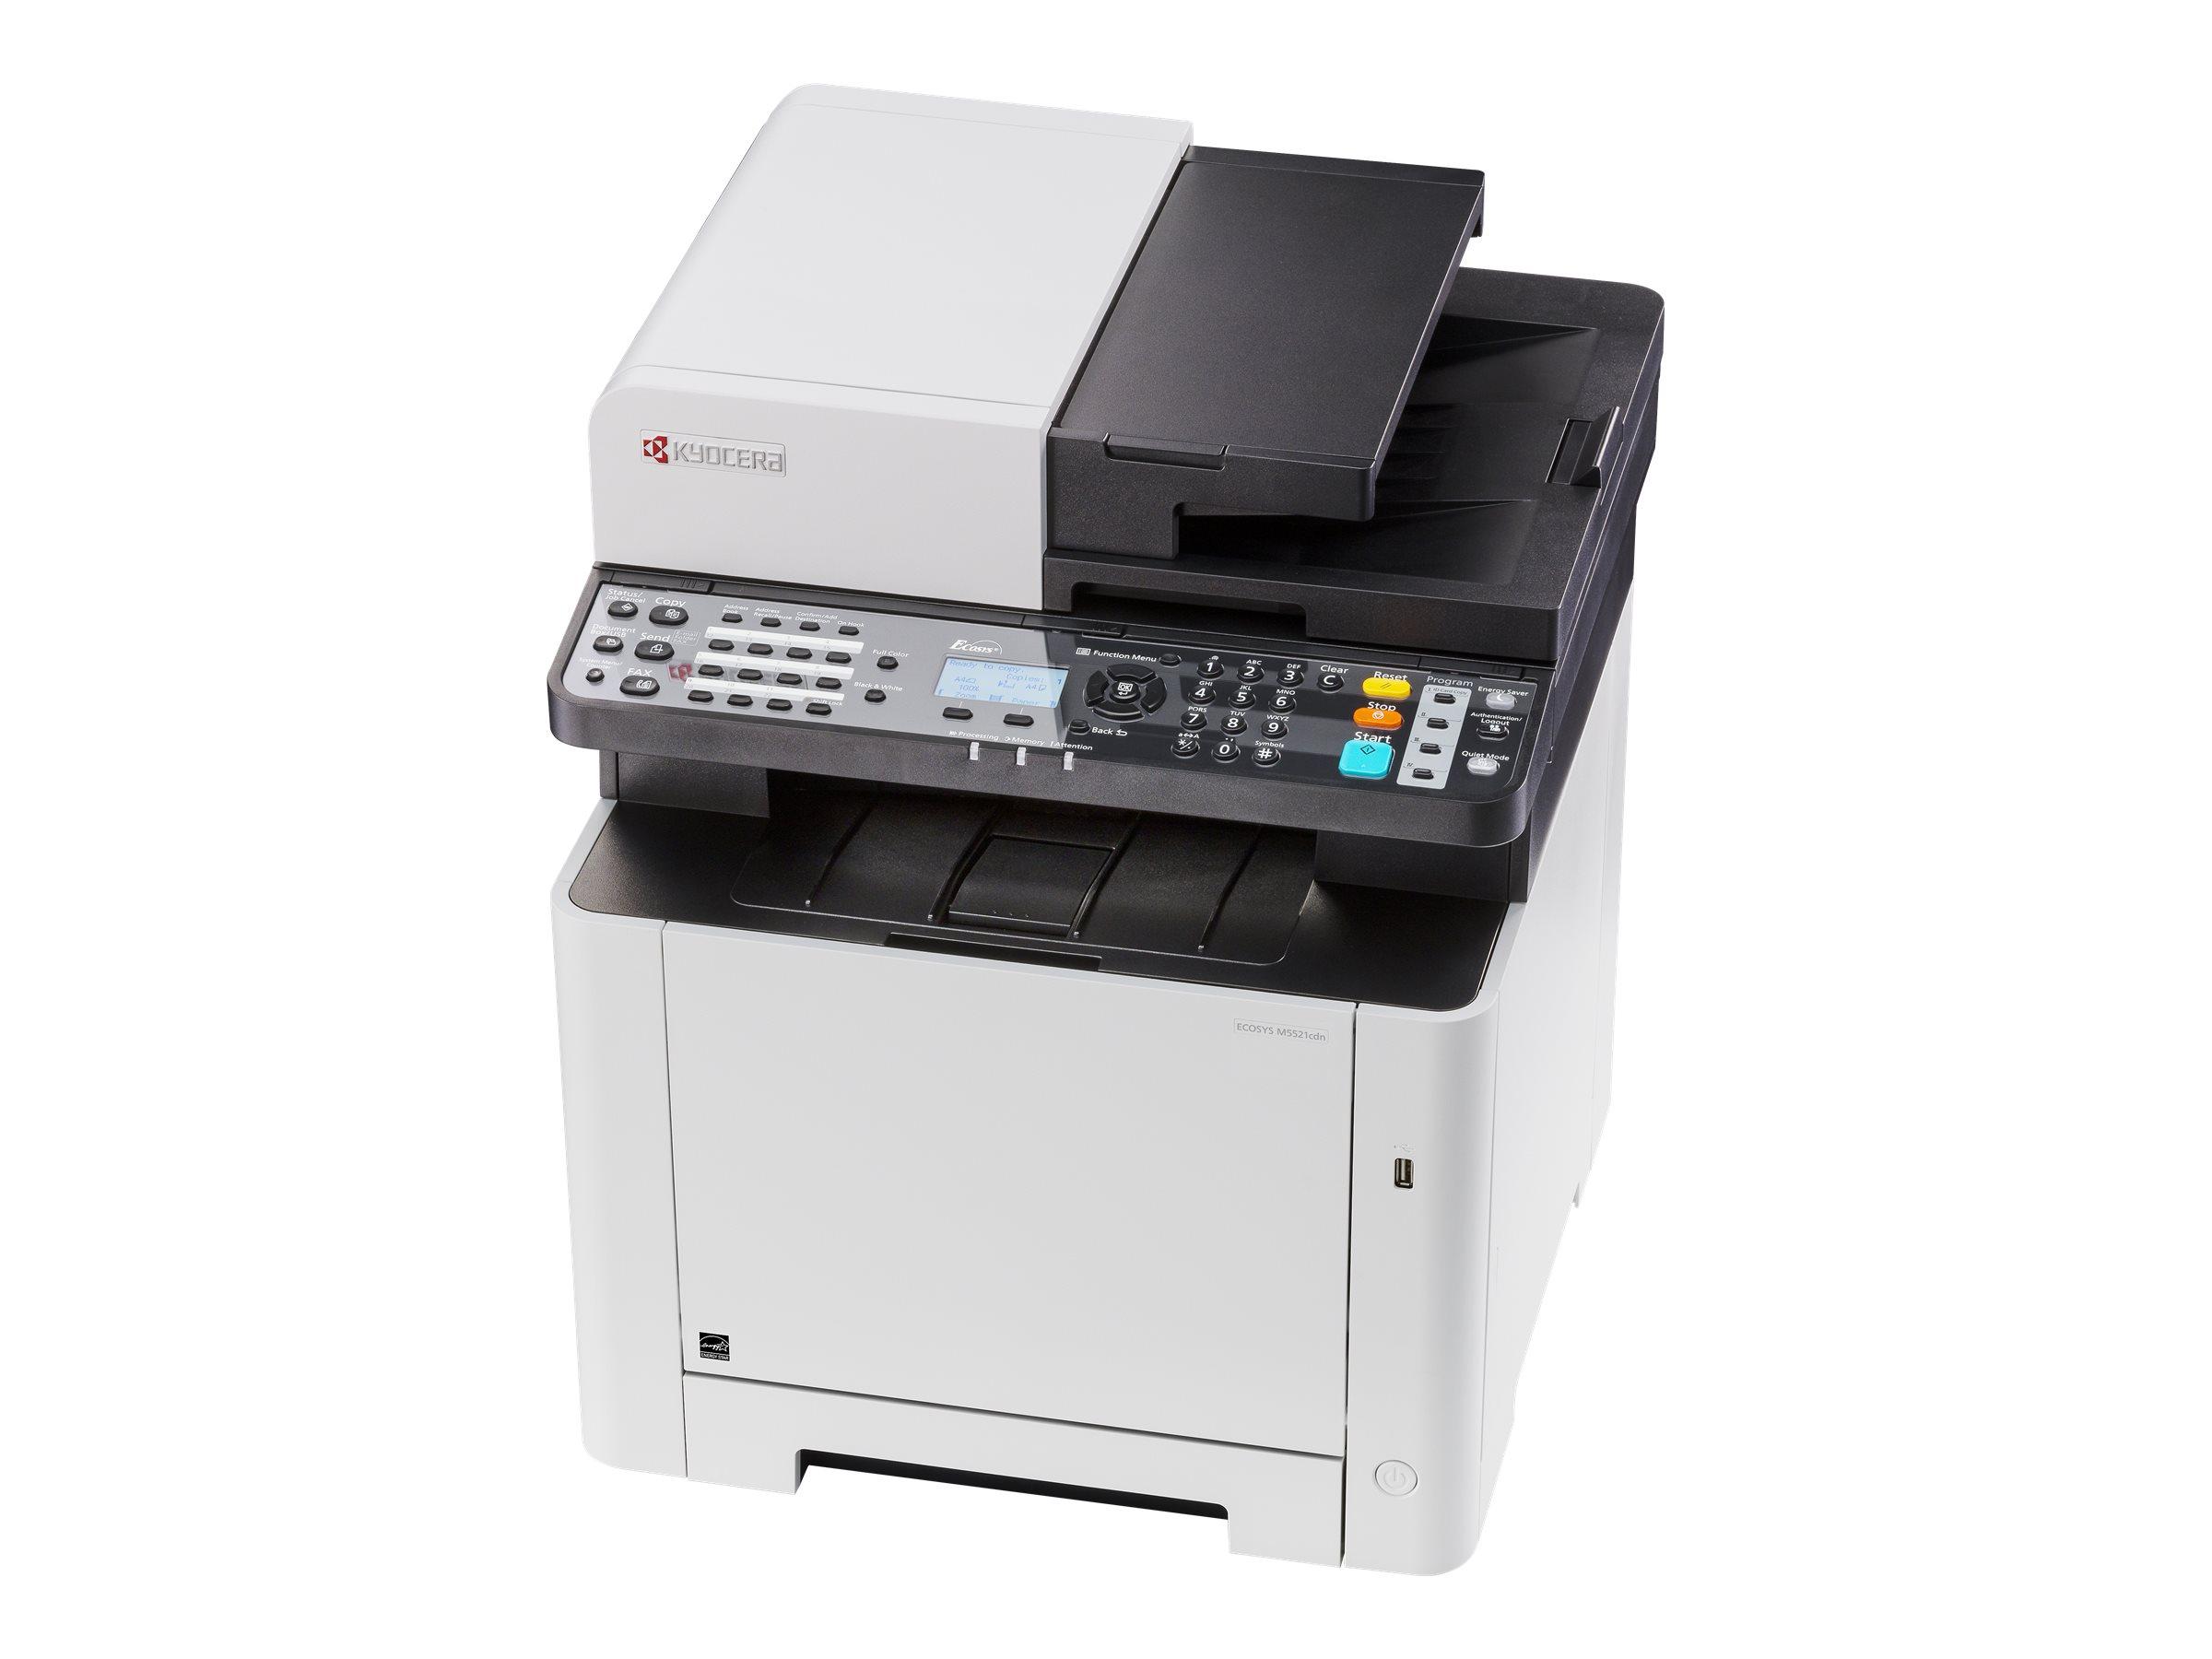 Kyocera ECOSYS M5521cdn - Multifunktionsdrucker - Farbe - Laser - Legal (216 x 356 mm)/A4 (210 x 297 mm) (Original) - A4/Legal (